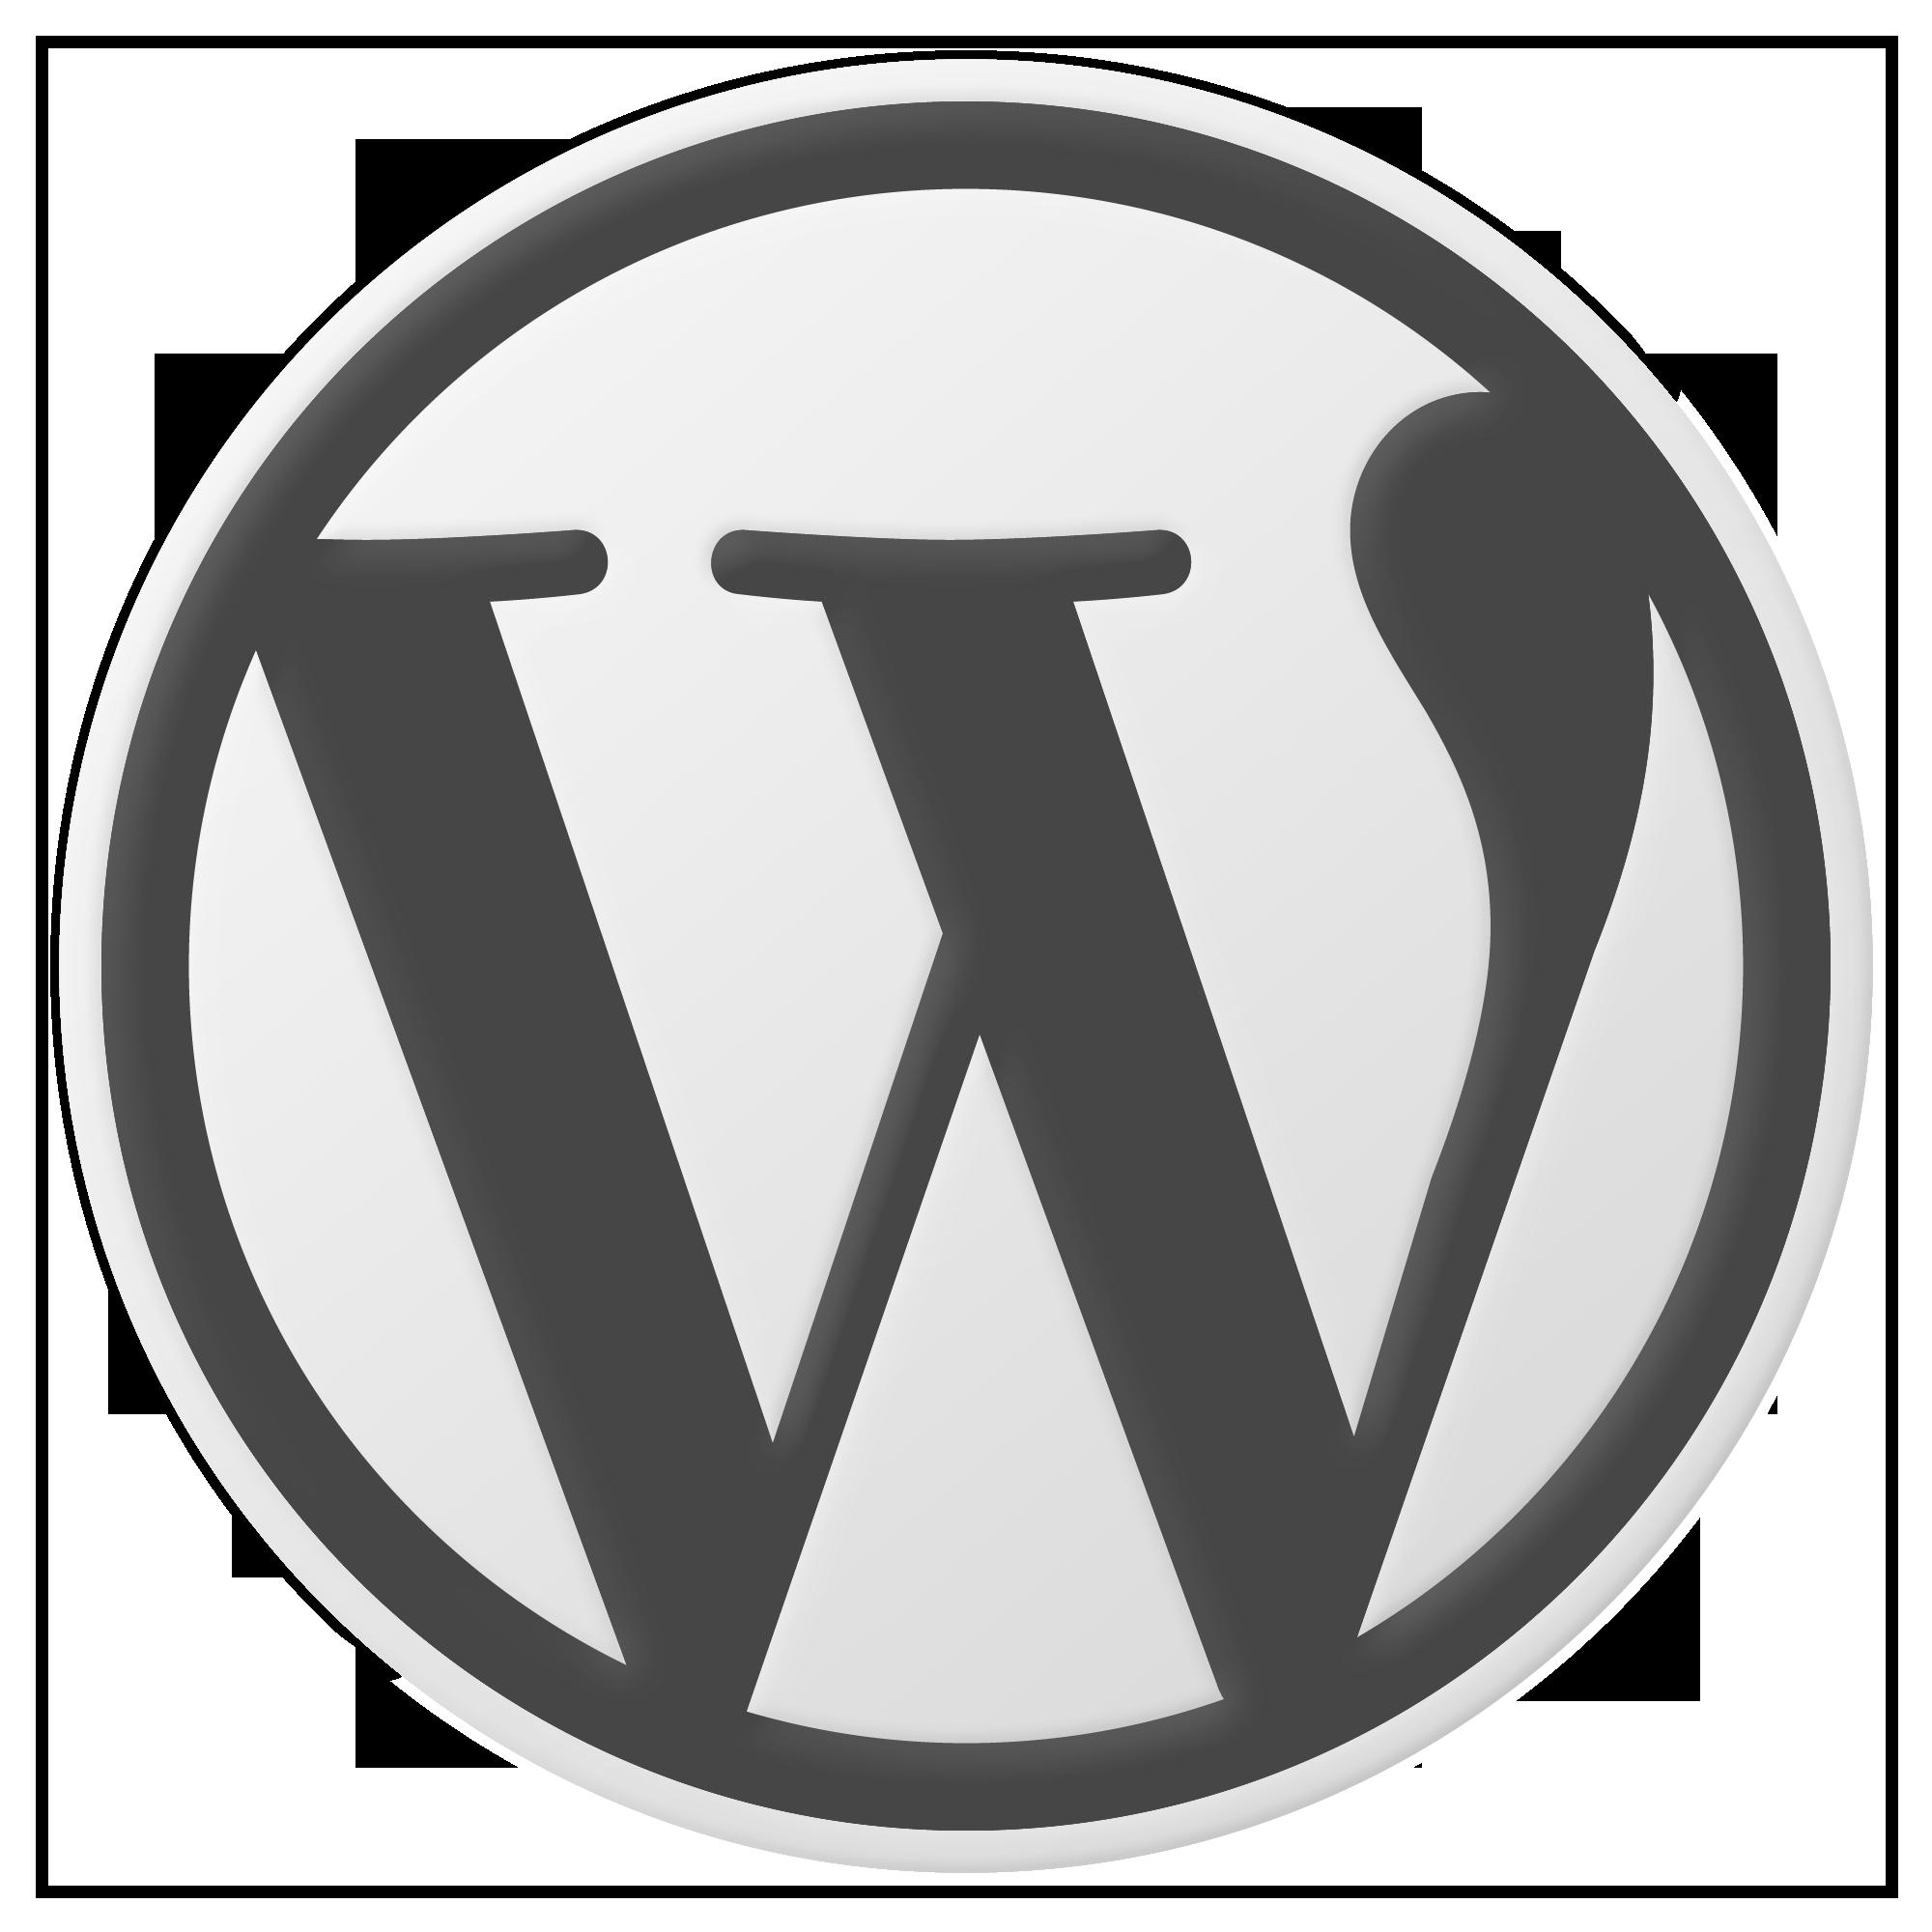 Wordpress: What's New With WordPress 3.1?